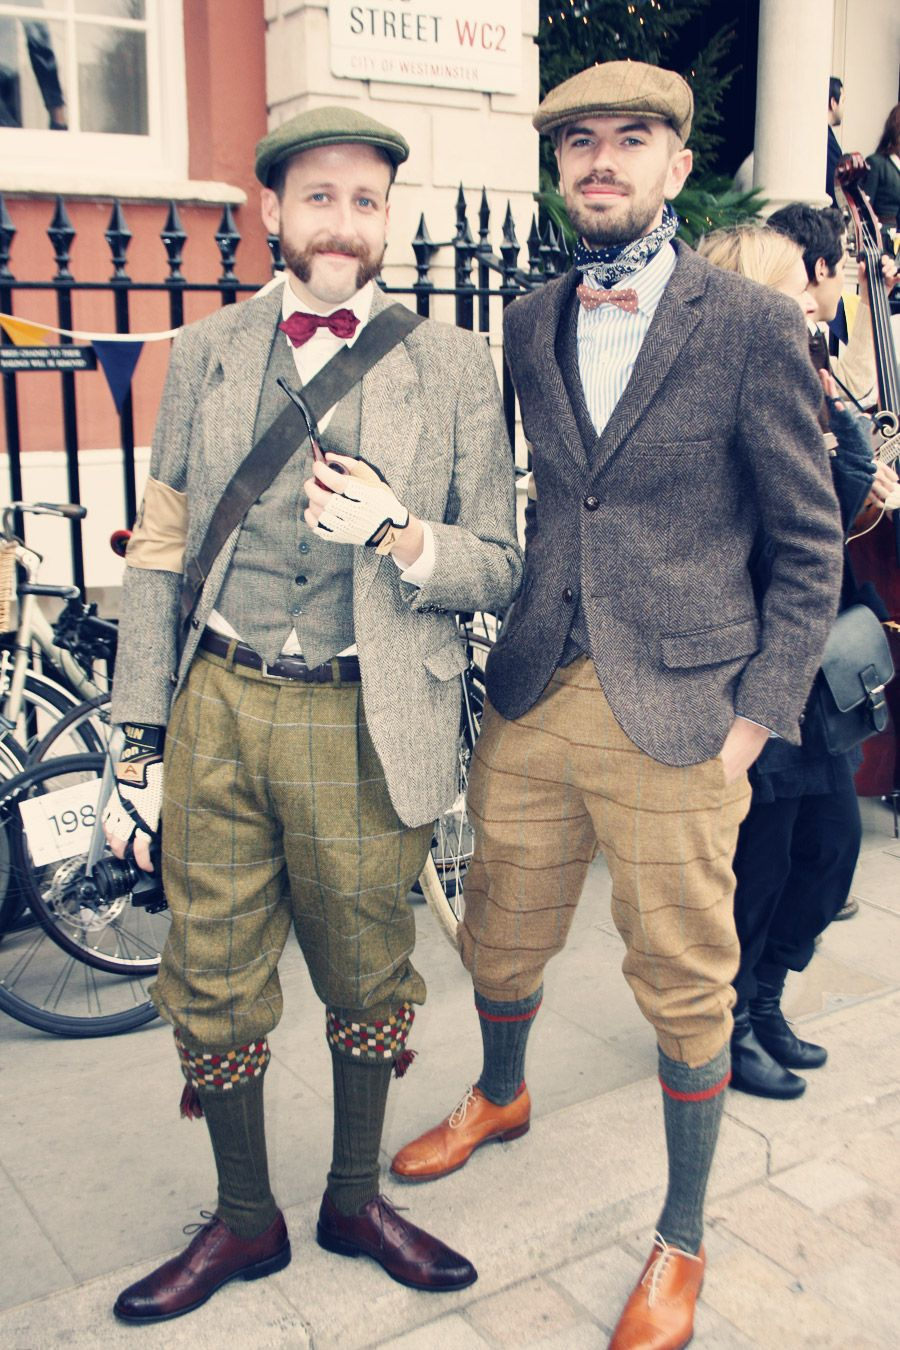 Vintage Modern Gents London Tweed Run A Bit Much But Still